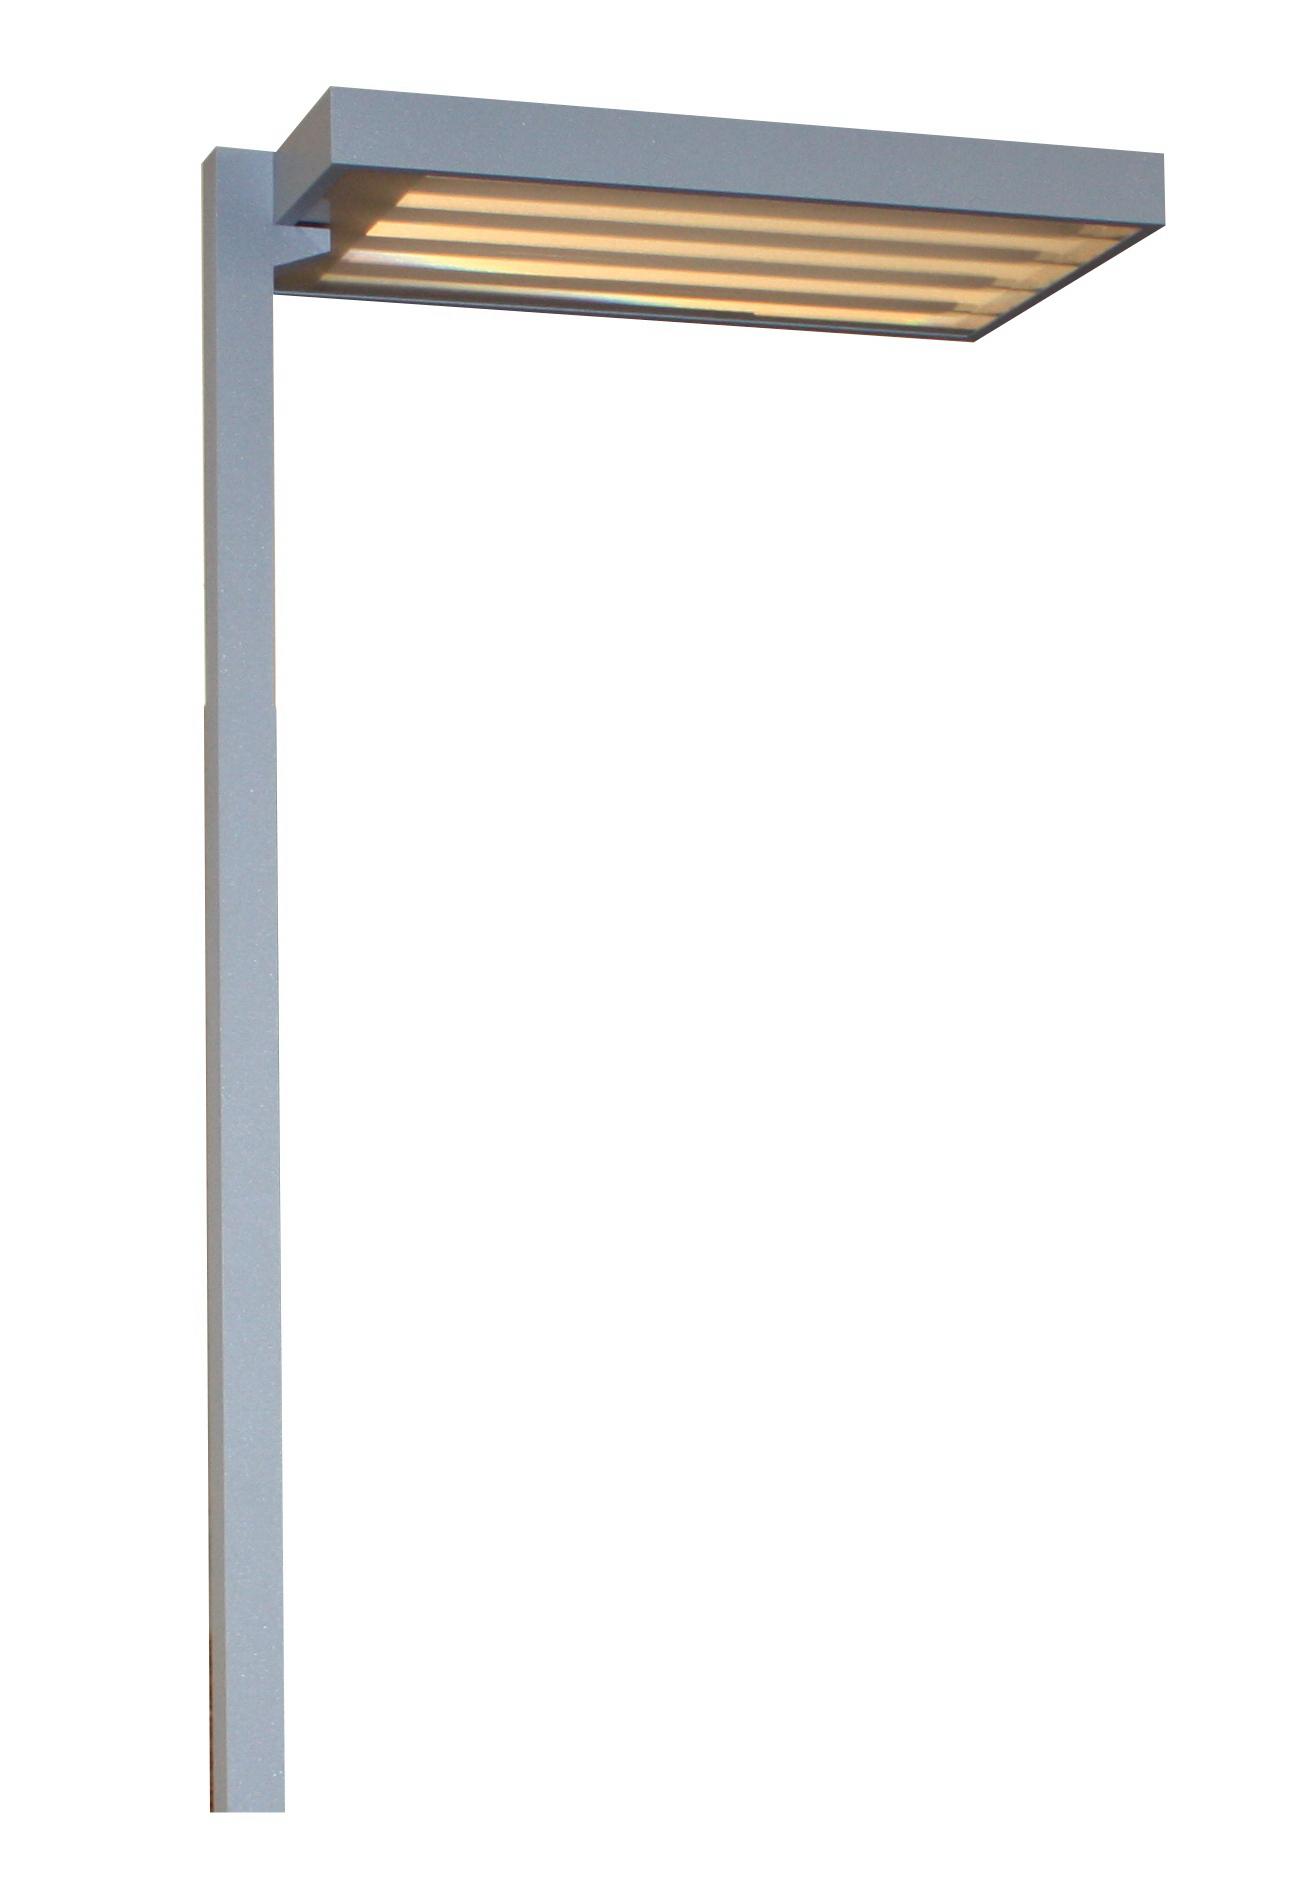 1 Stk Office Stehleuchte SVO TC-L, 4x55W, Sensor und Tast-Dimmer LISVO455SR